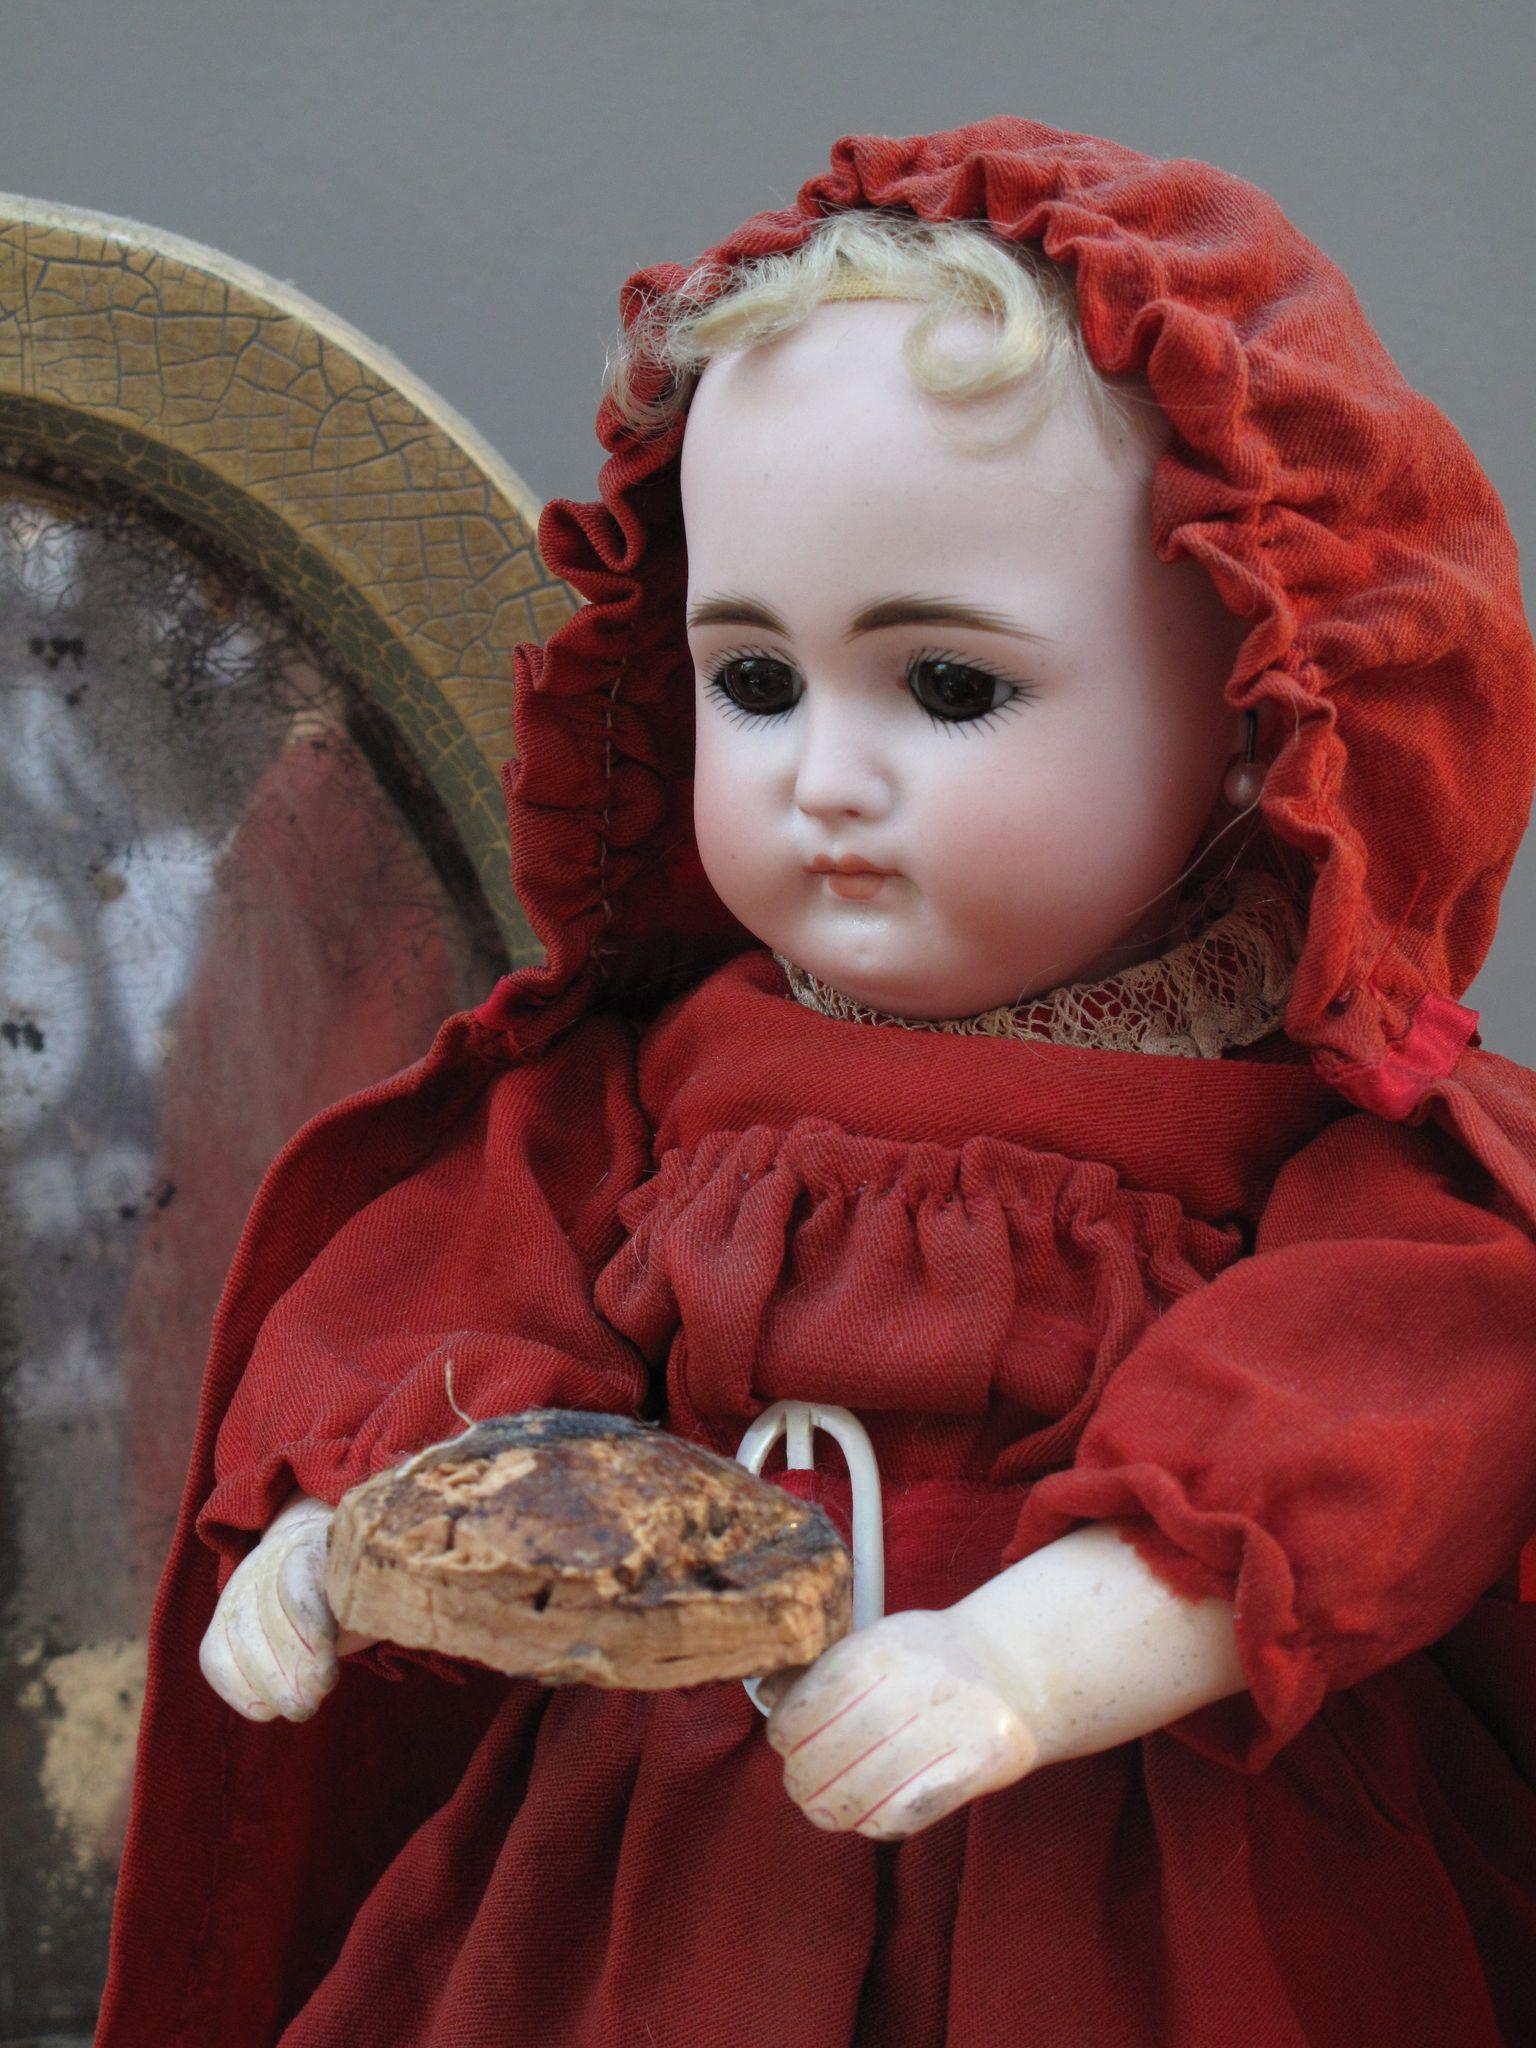 Precious Tiny Cork Pate for Your Petite Poupee'